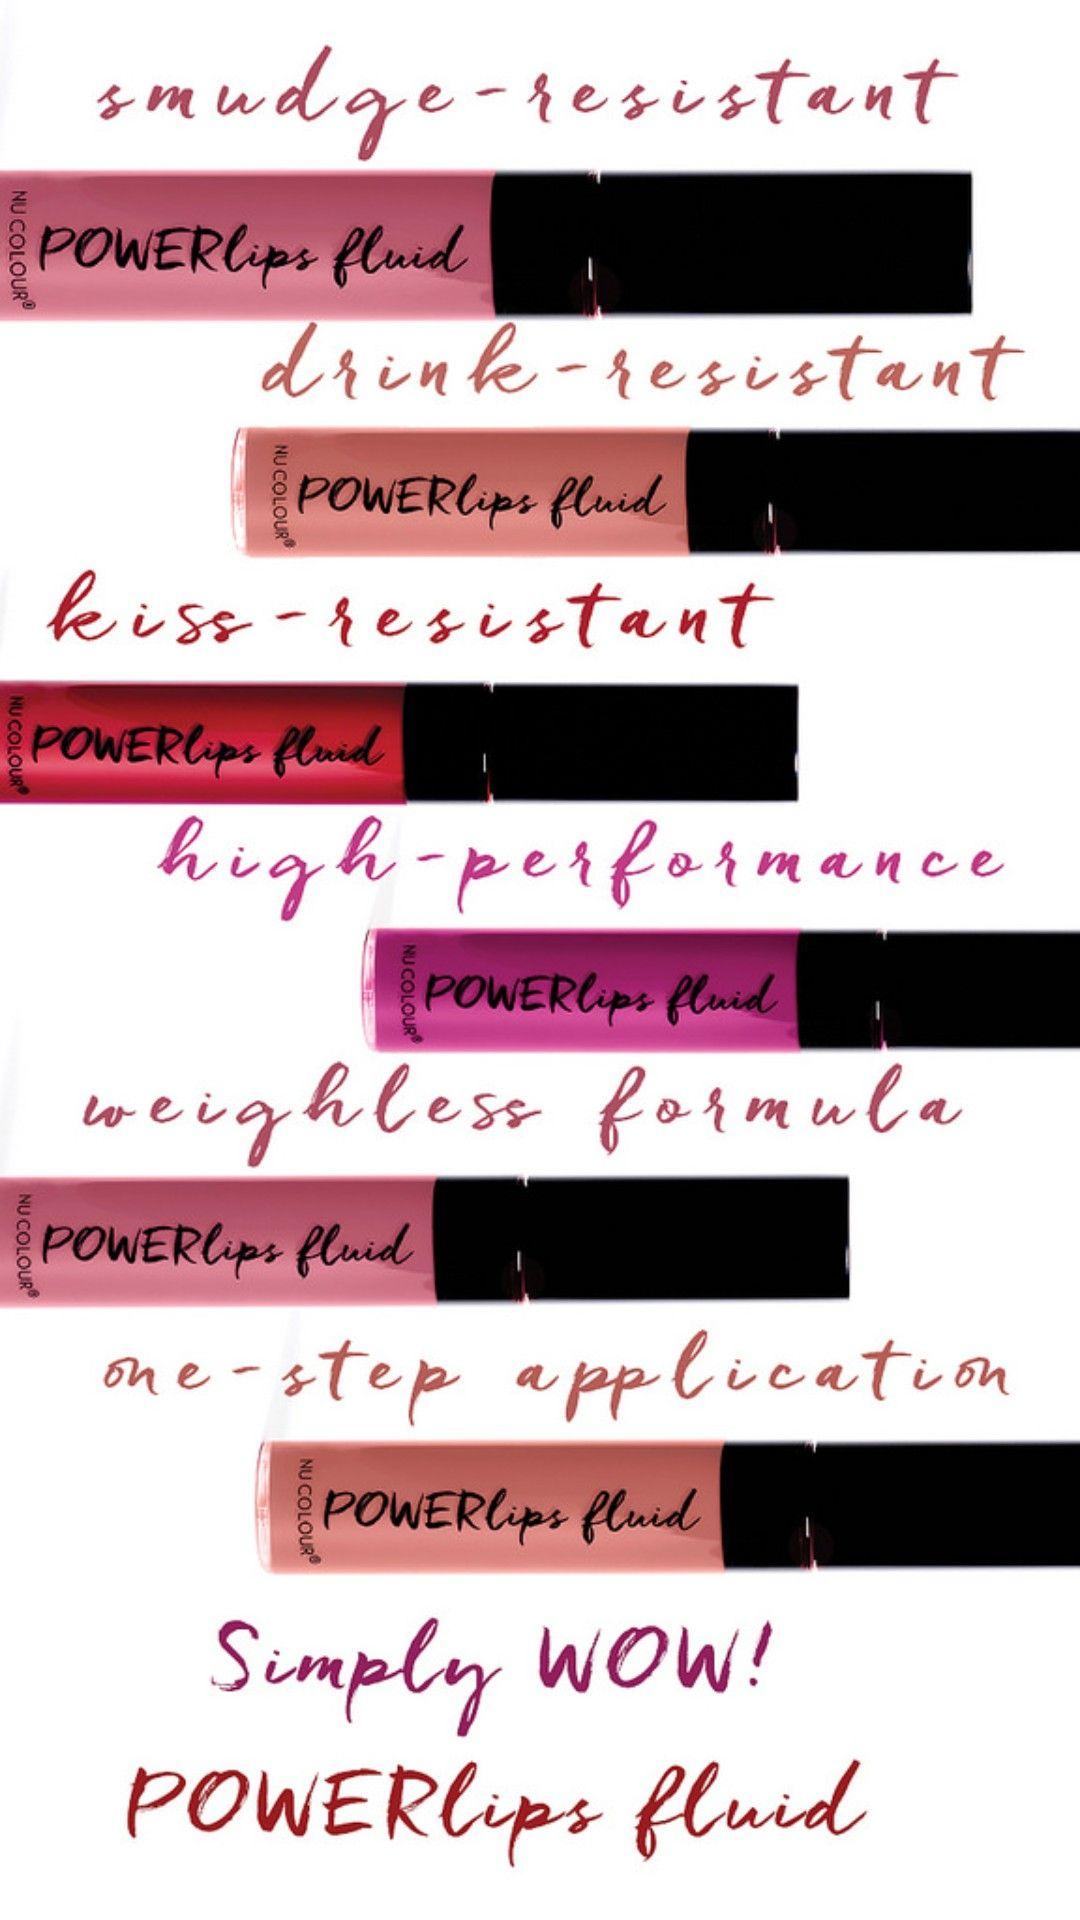 Powerlips fluid! | nuskin | Pinterest | Diseños para uñas, Cuidado ...